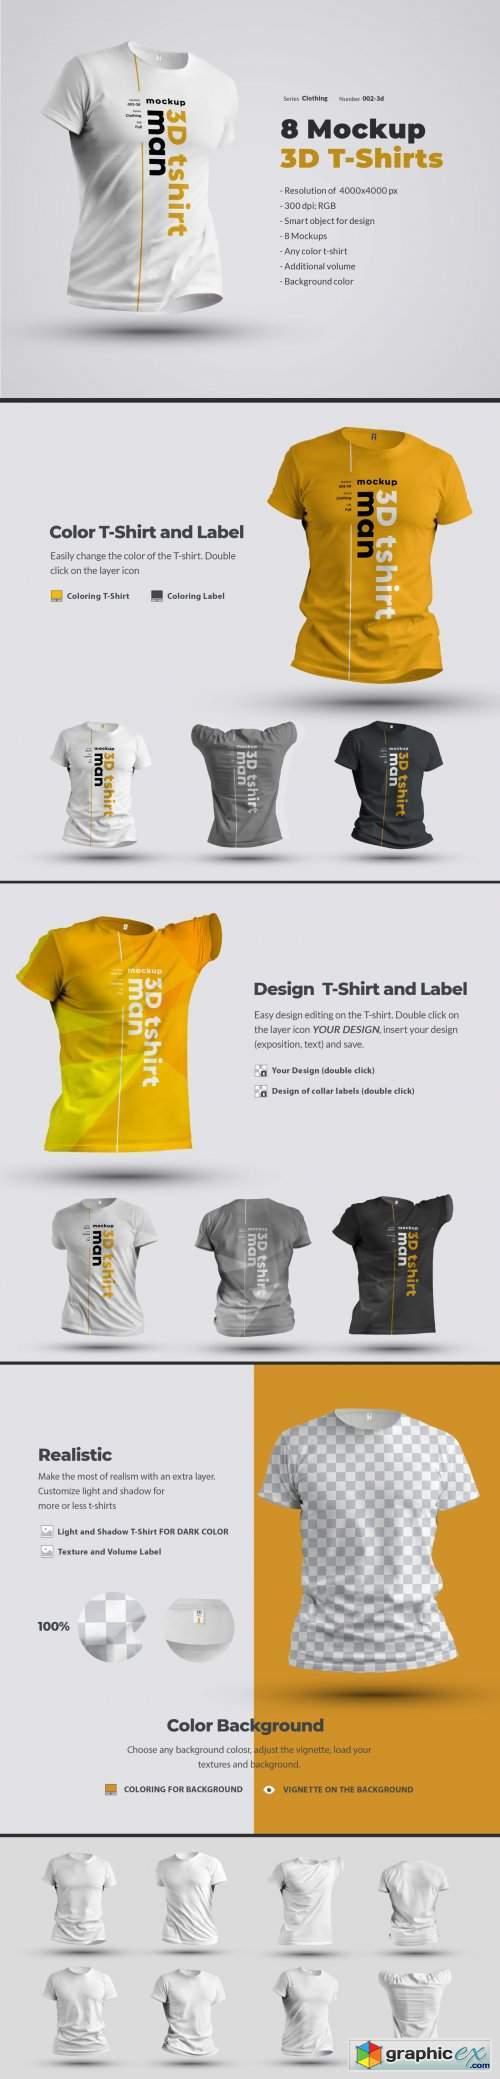 8 Mockups 3D T-Shirts